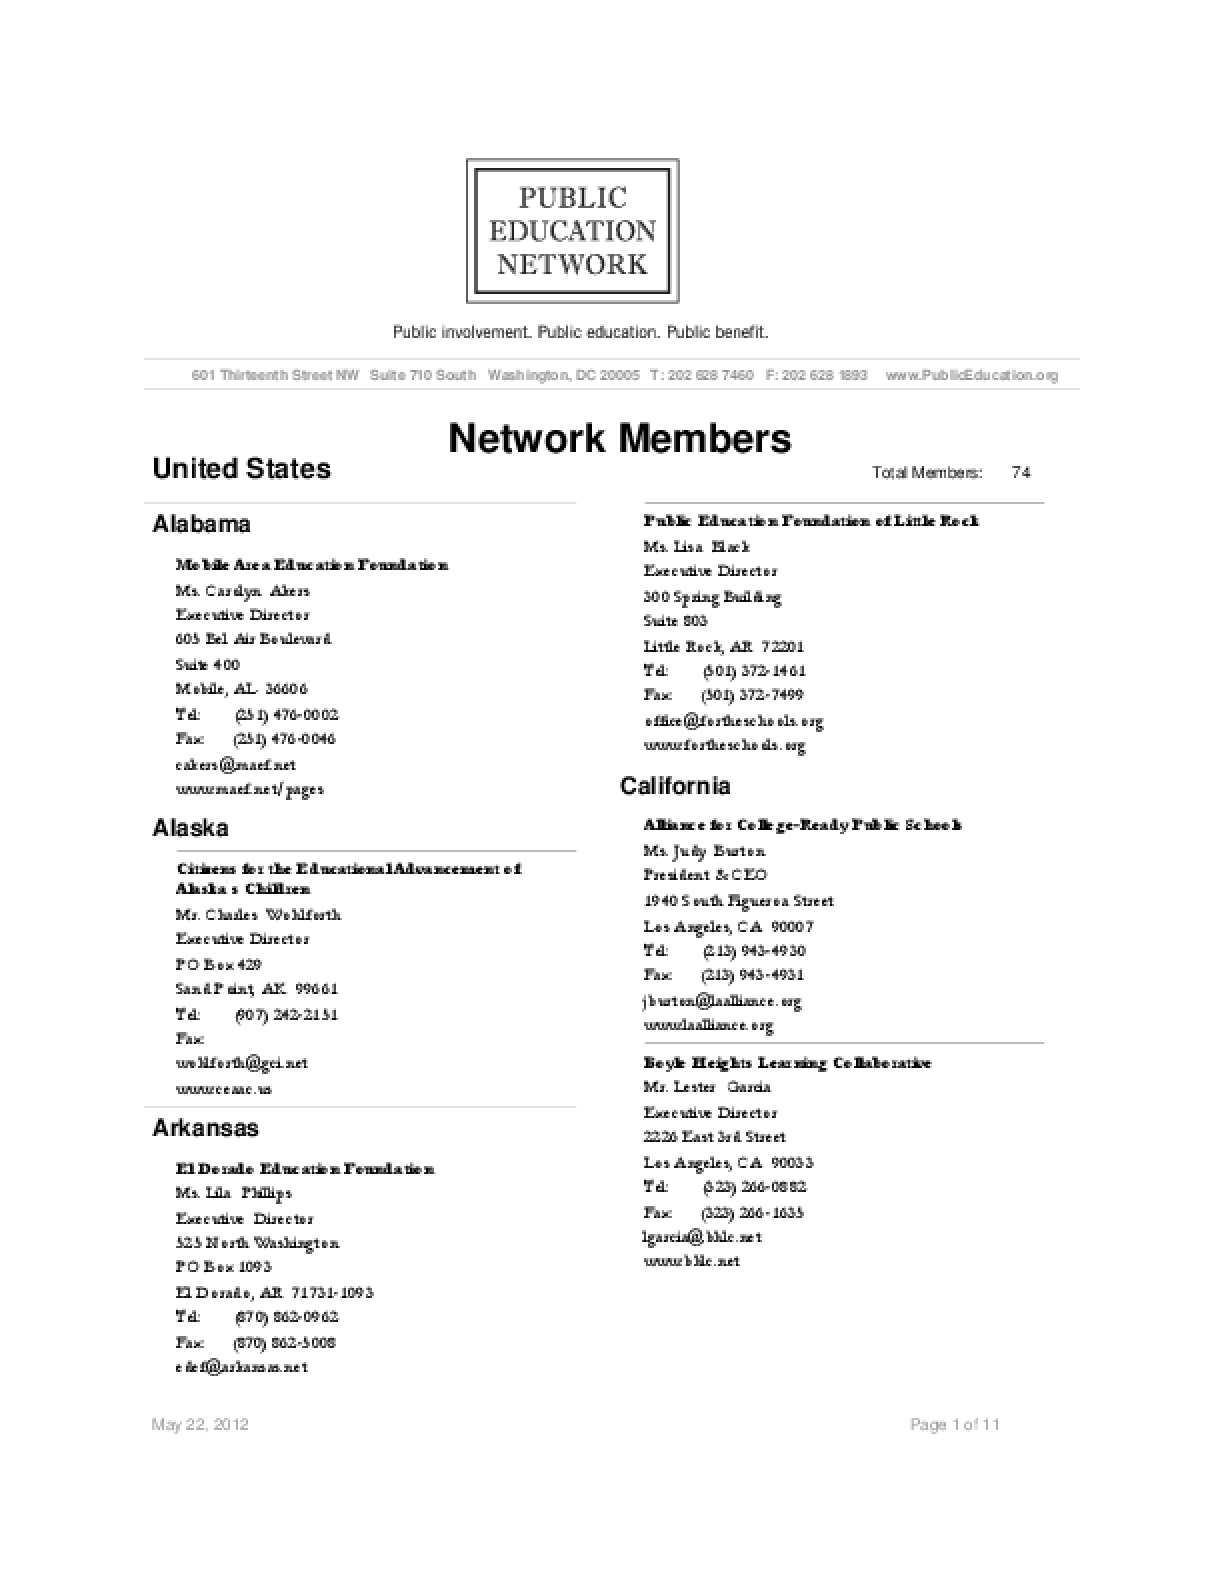 Public Education Network (PEN) Members Directory